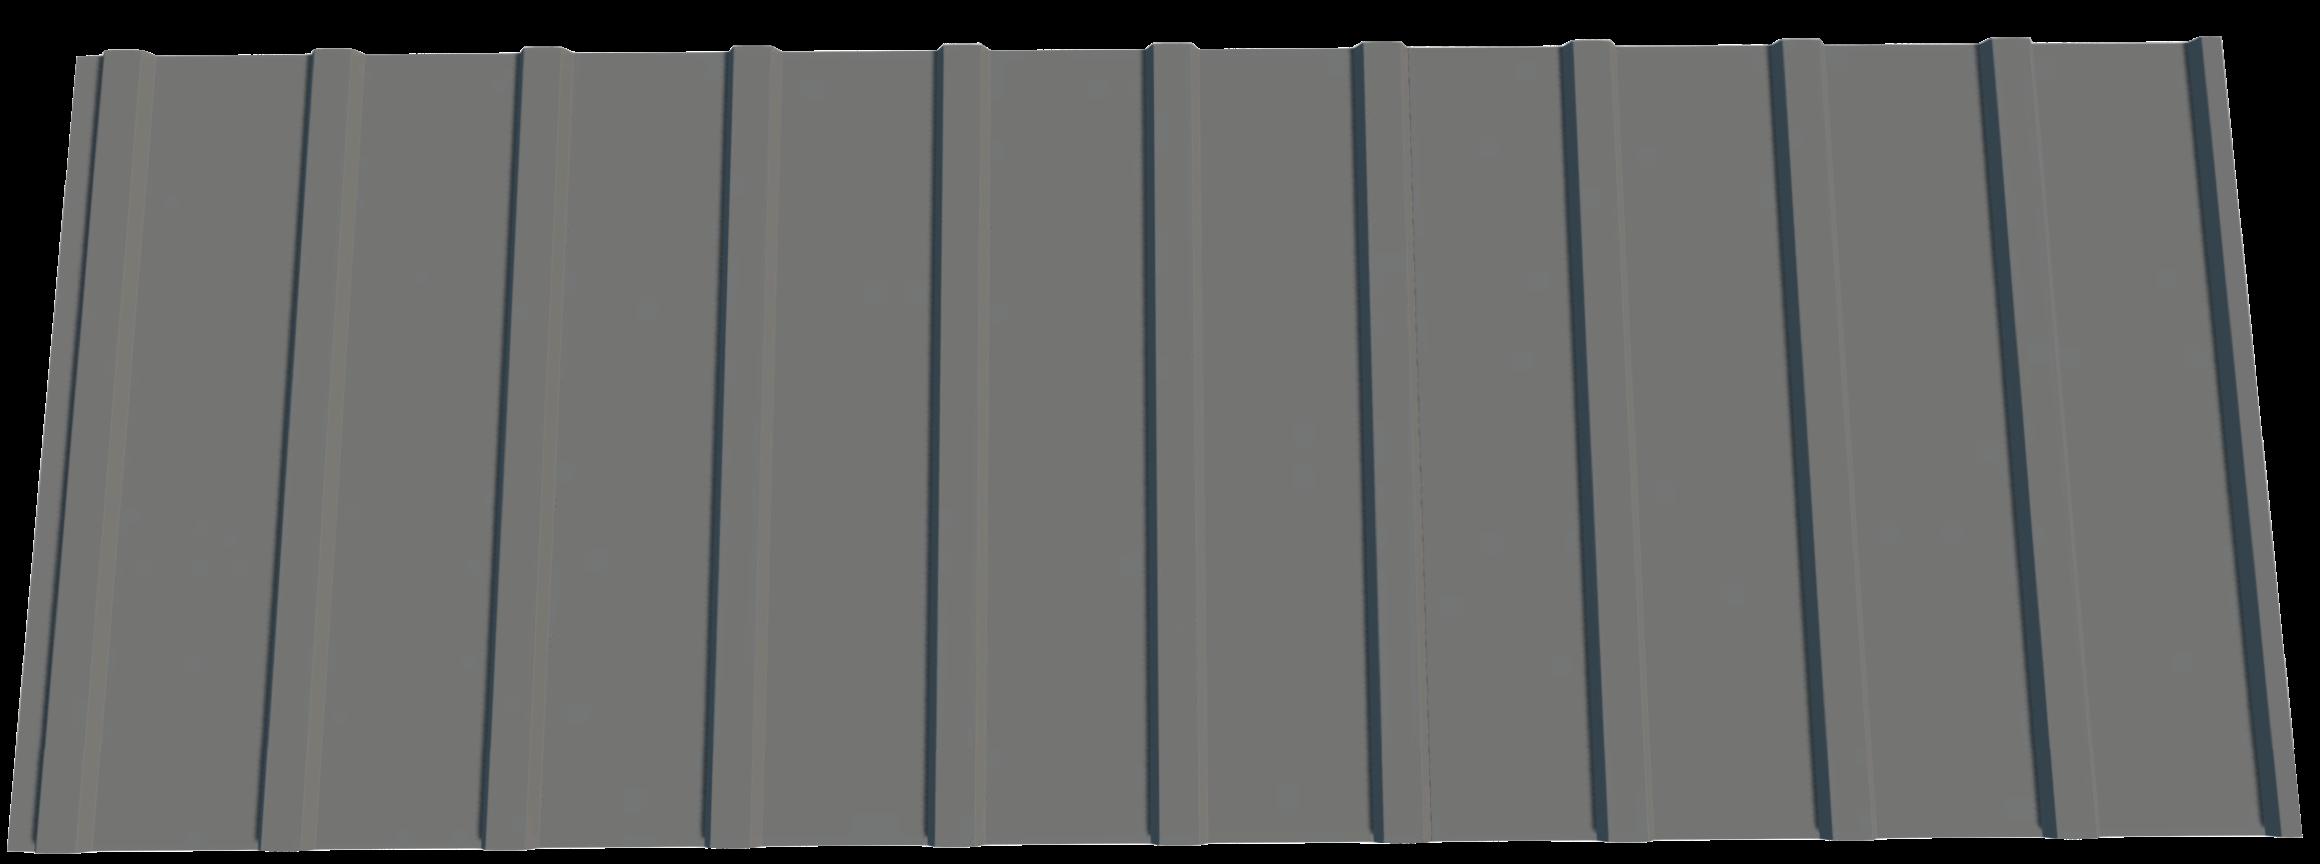 damwandplaten t12 wand